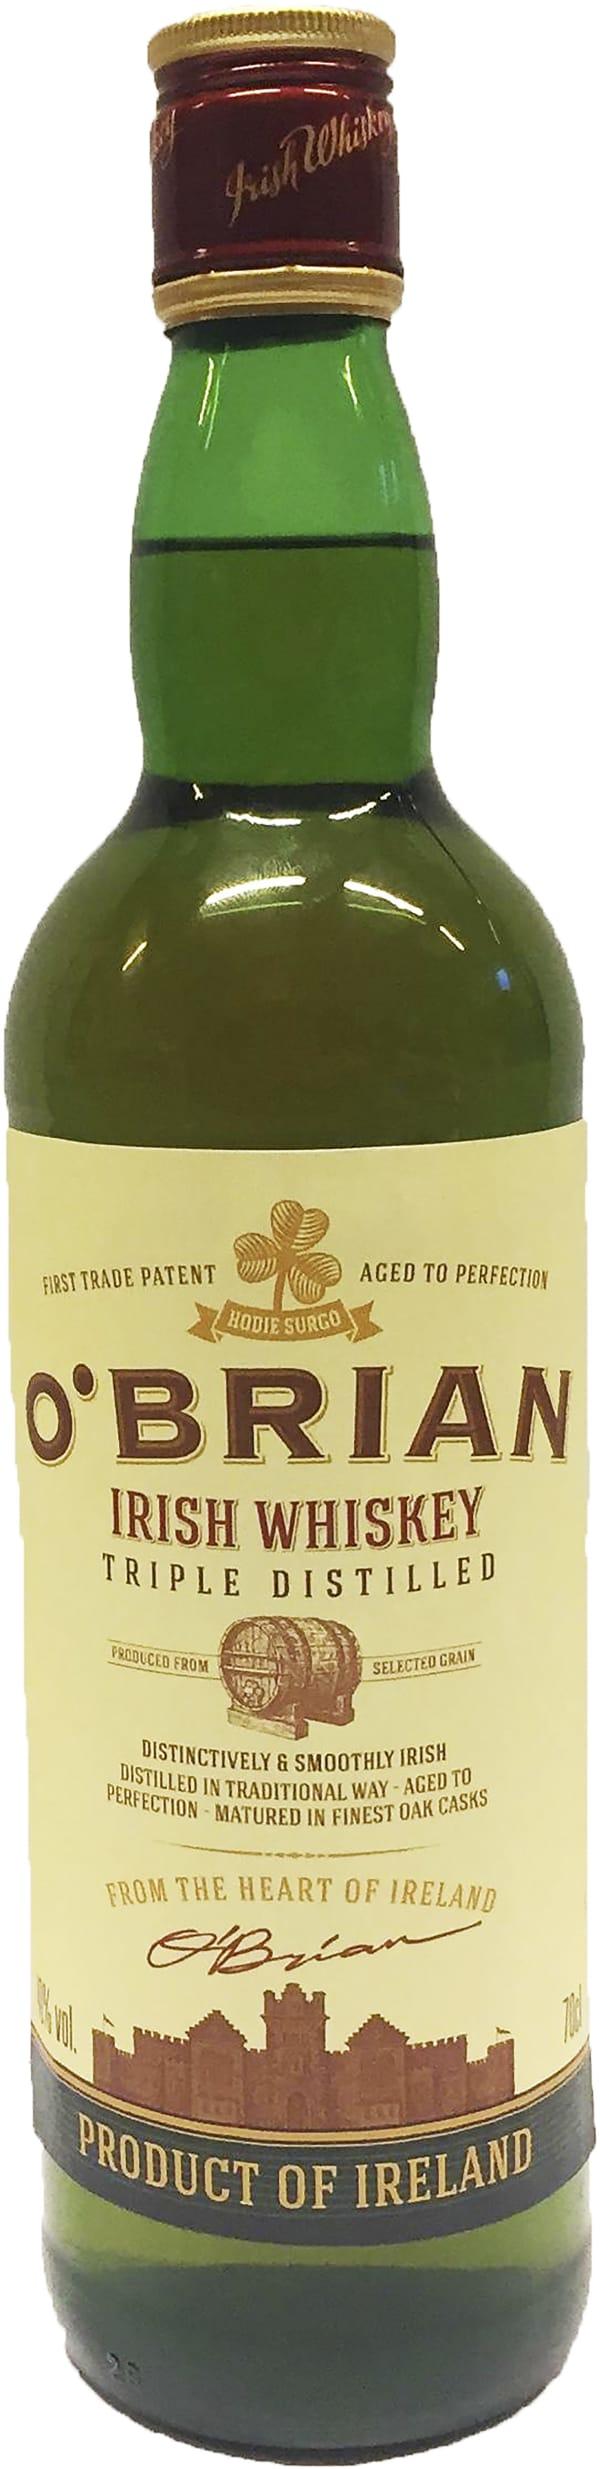 O'Brian Irish Whiskey